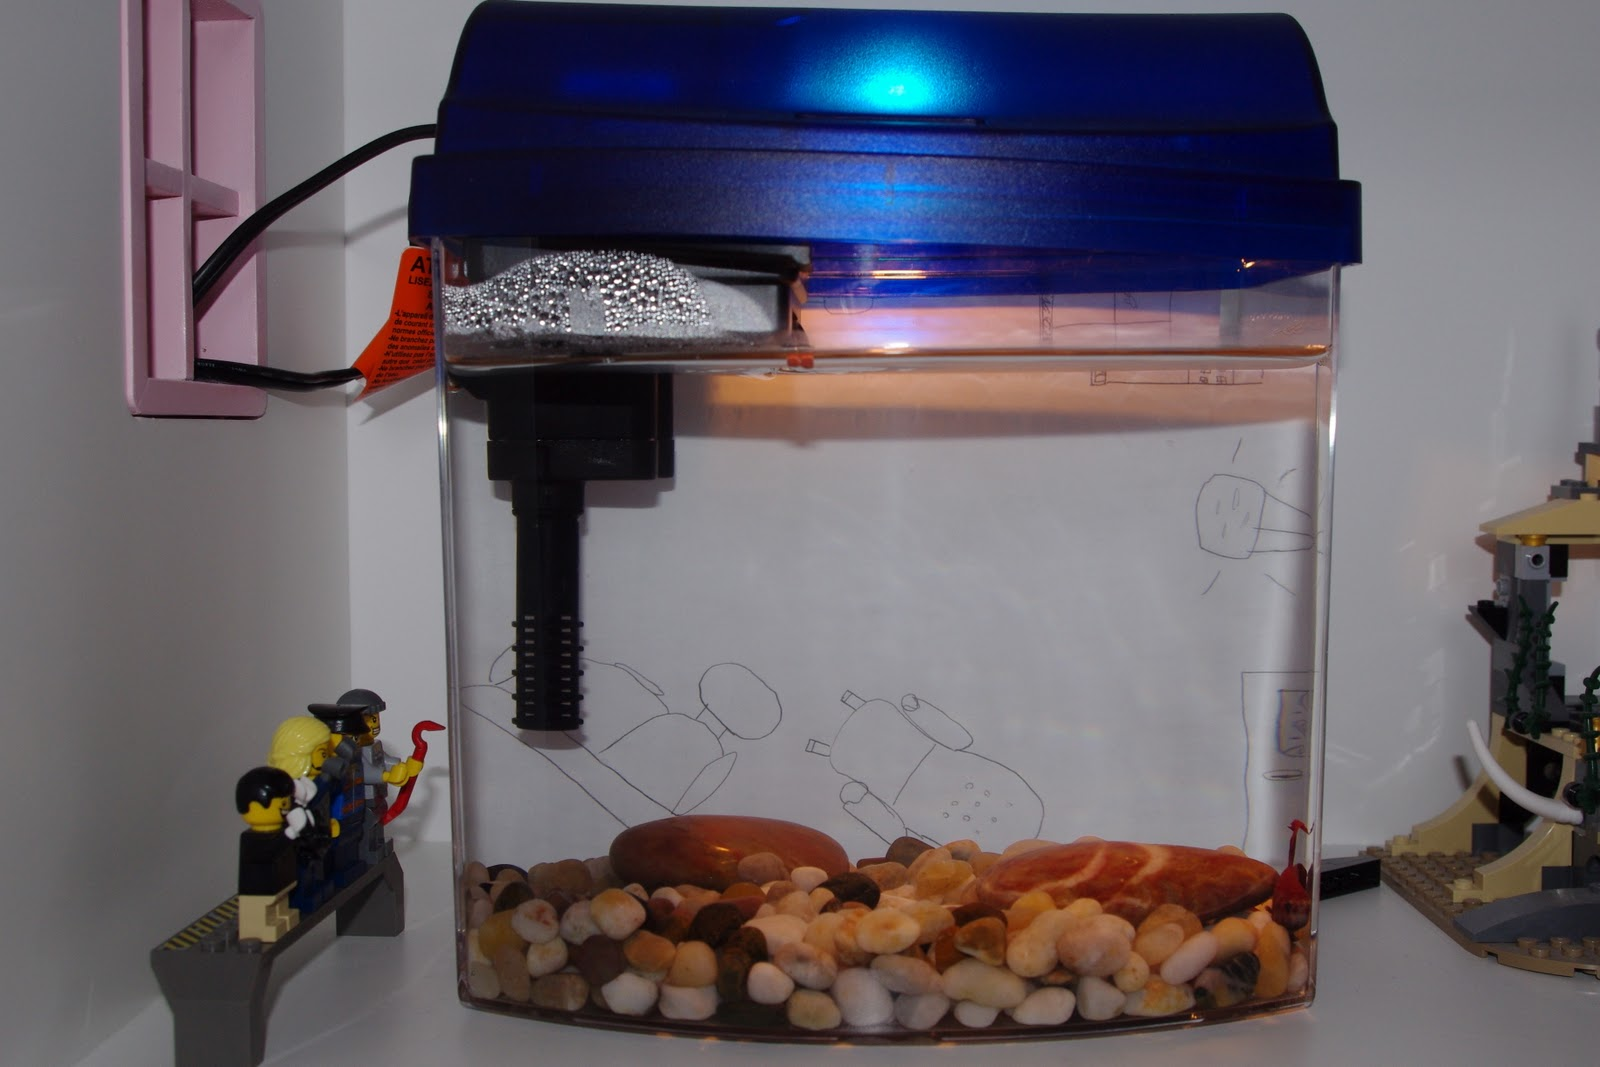 Cool fish tanks cheap funtrublog awesome aquariums 5 for Fish tanks cheap